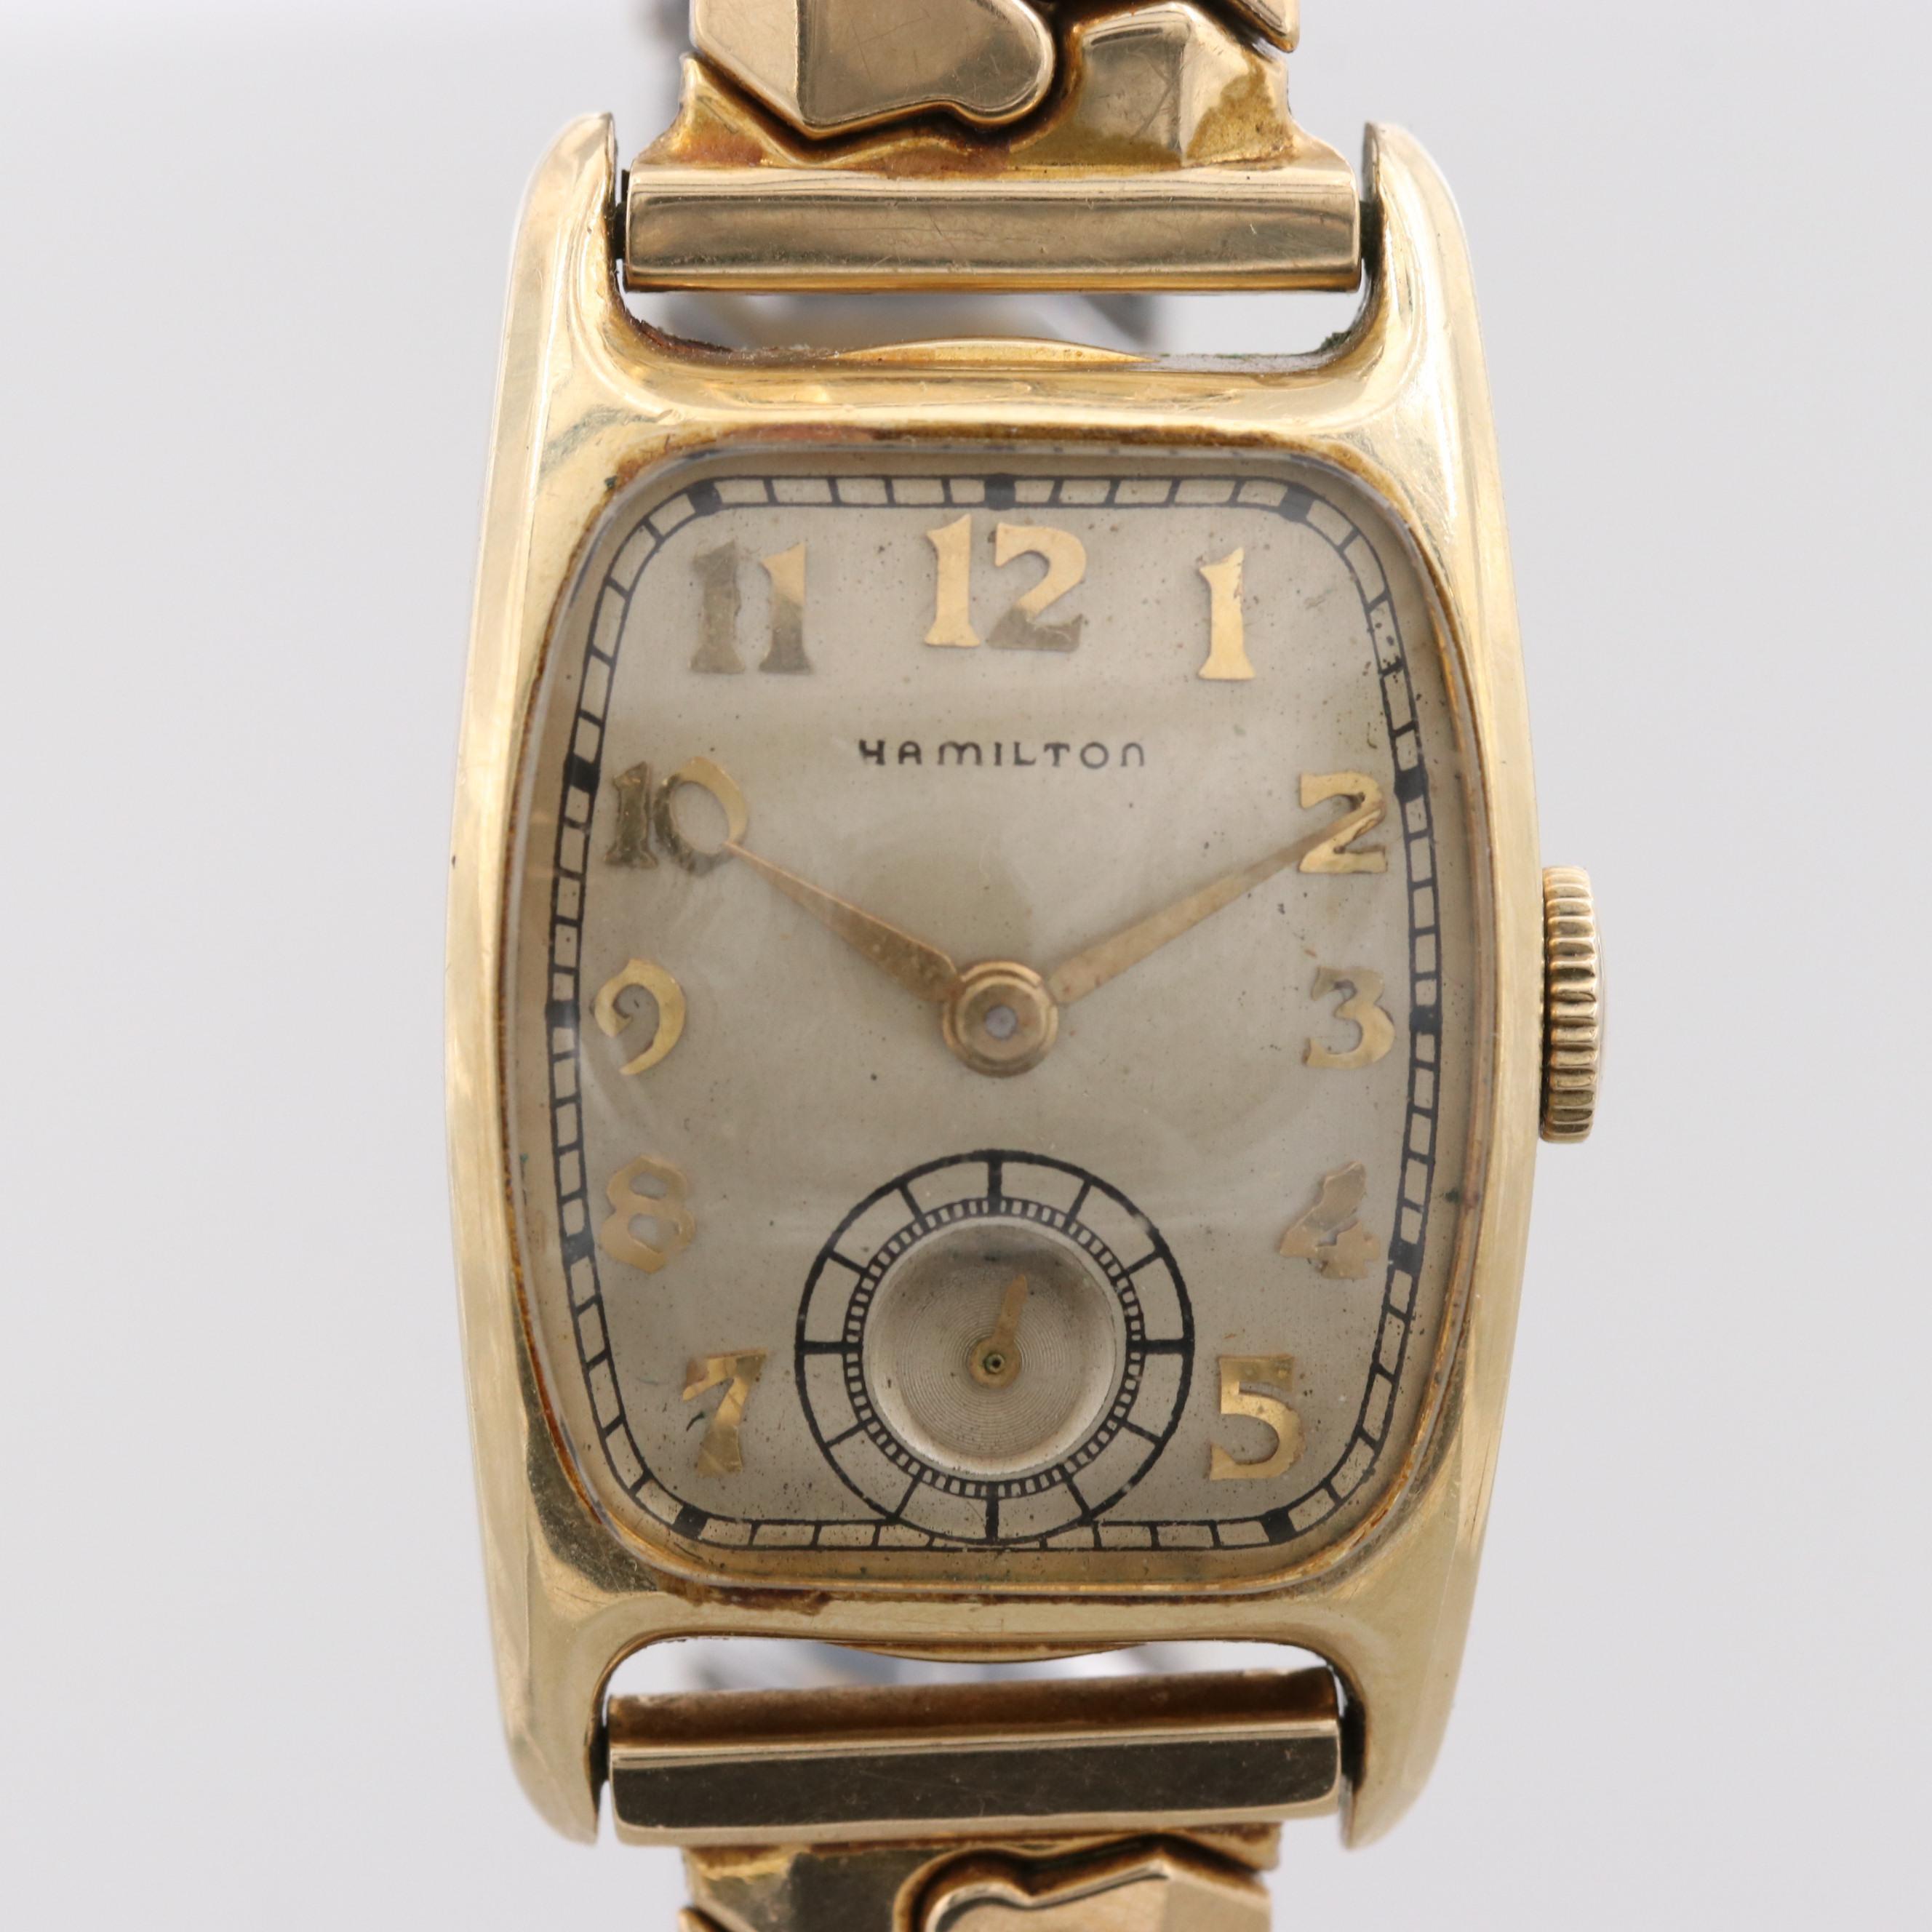 Hamilton 14K Gold Filled Wristwatch, 1946